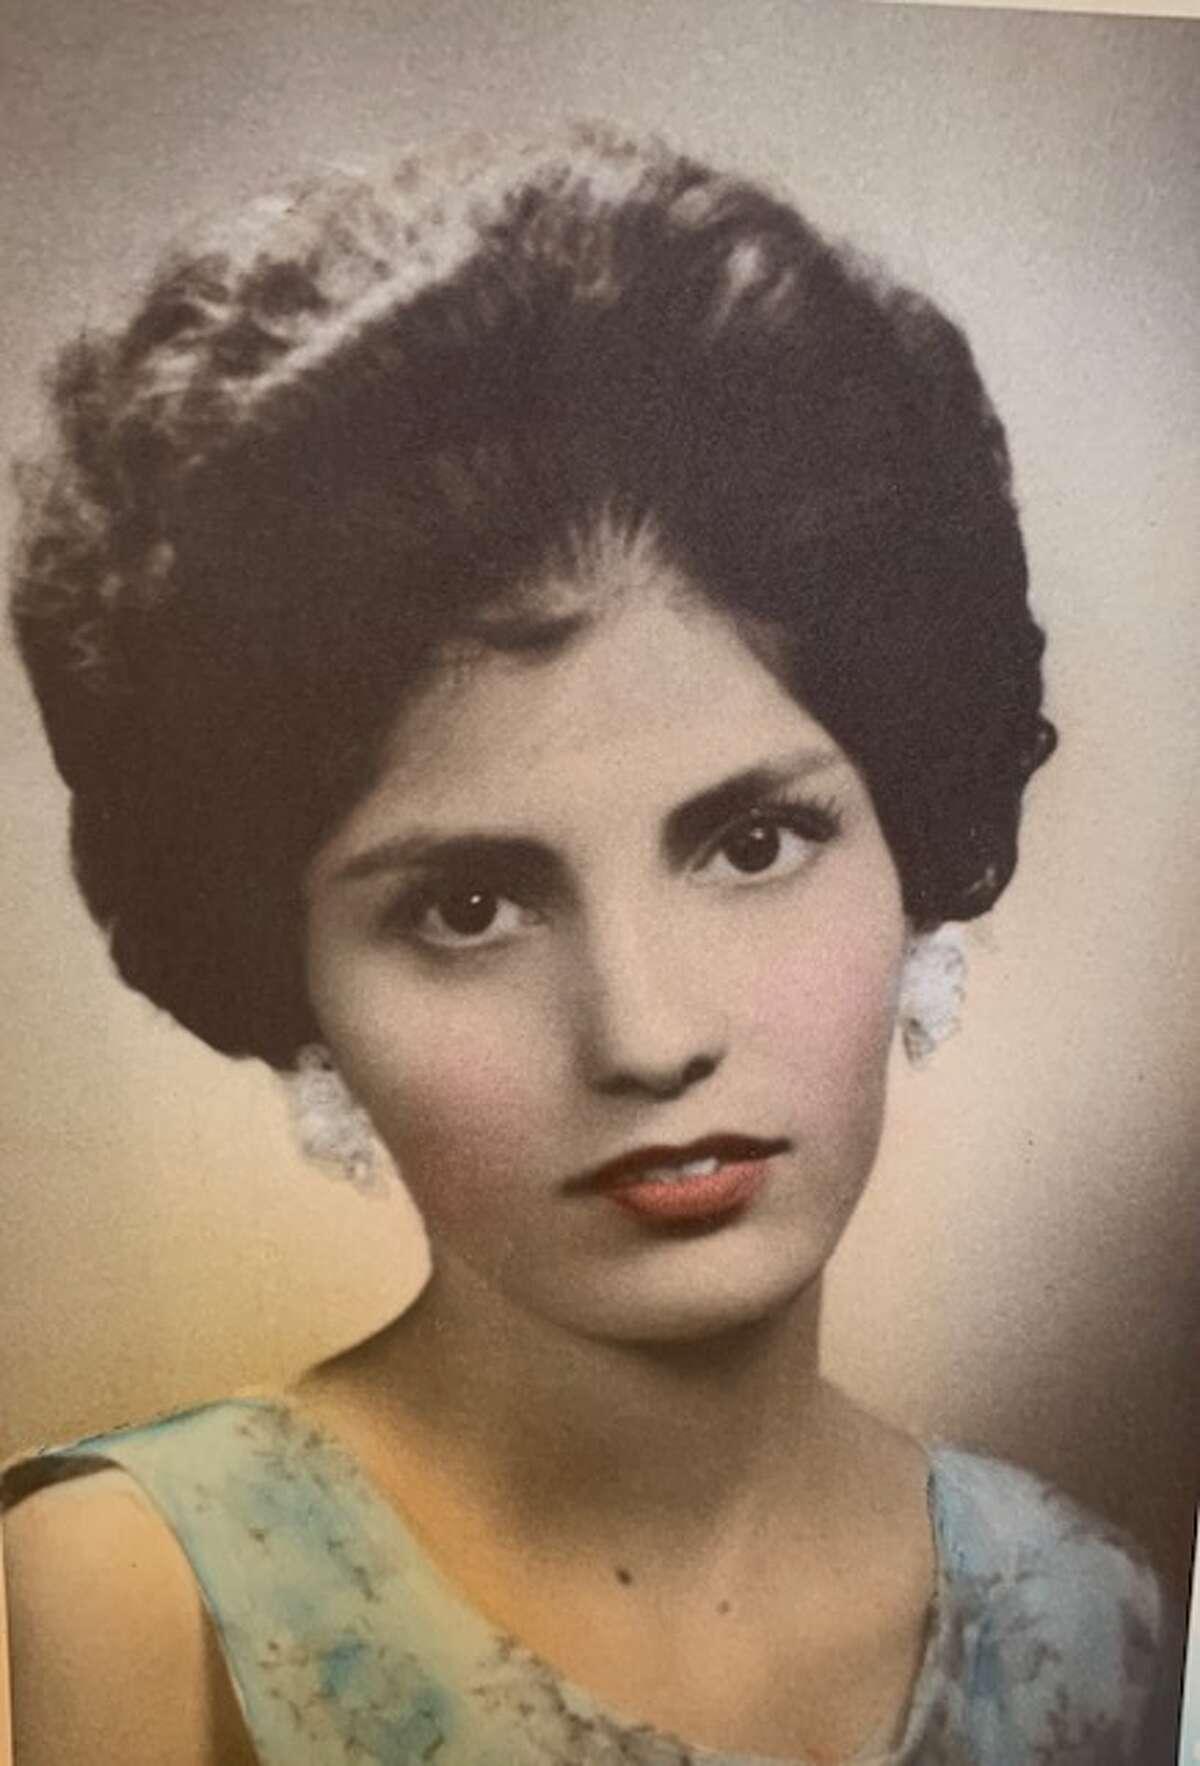 Maria Angela Velasquez